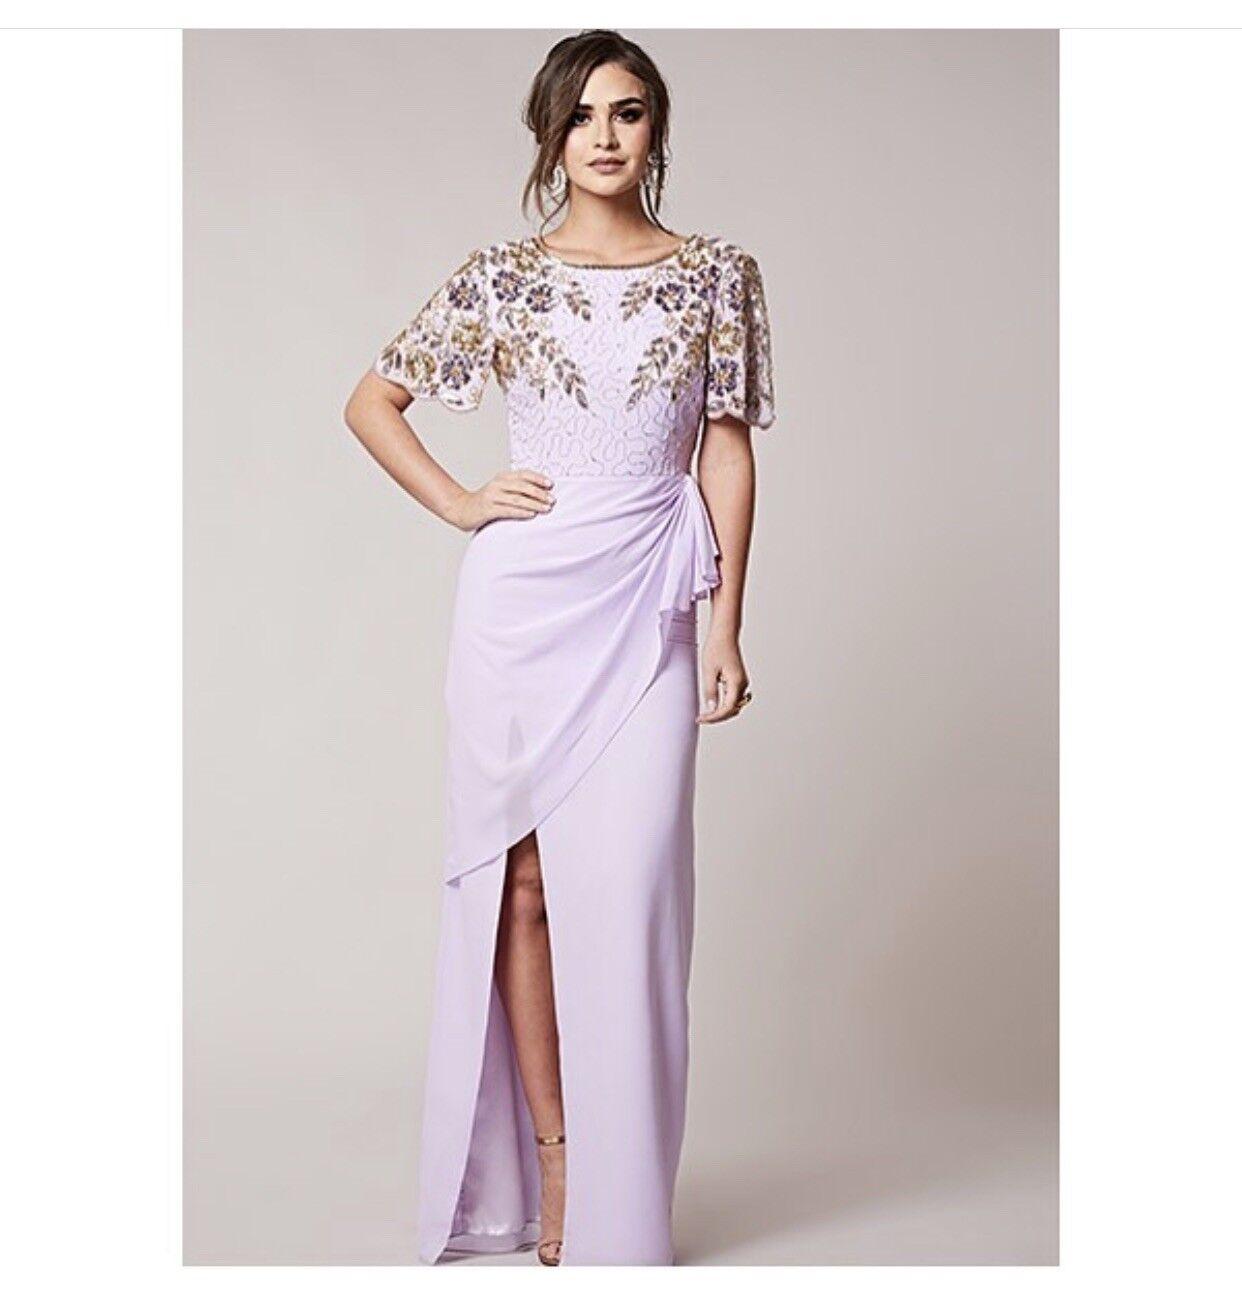 Dress 6 BNWT Virgos Lounge Lounge Lounge Embellished Midi Wedding Prom Occassion ASOS 01dd32